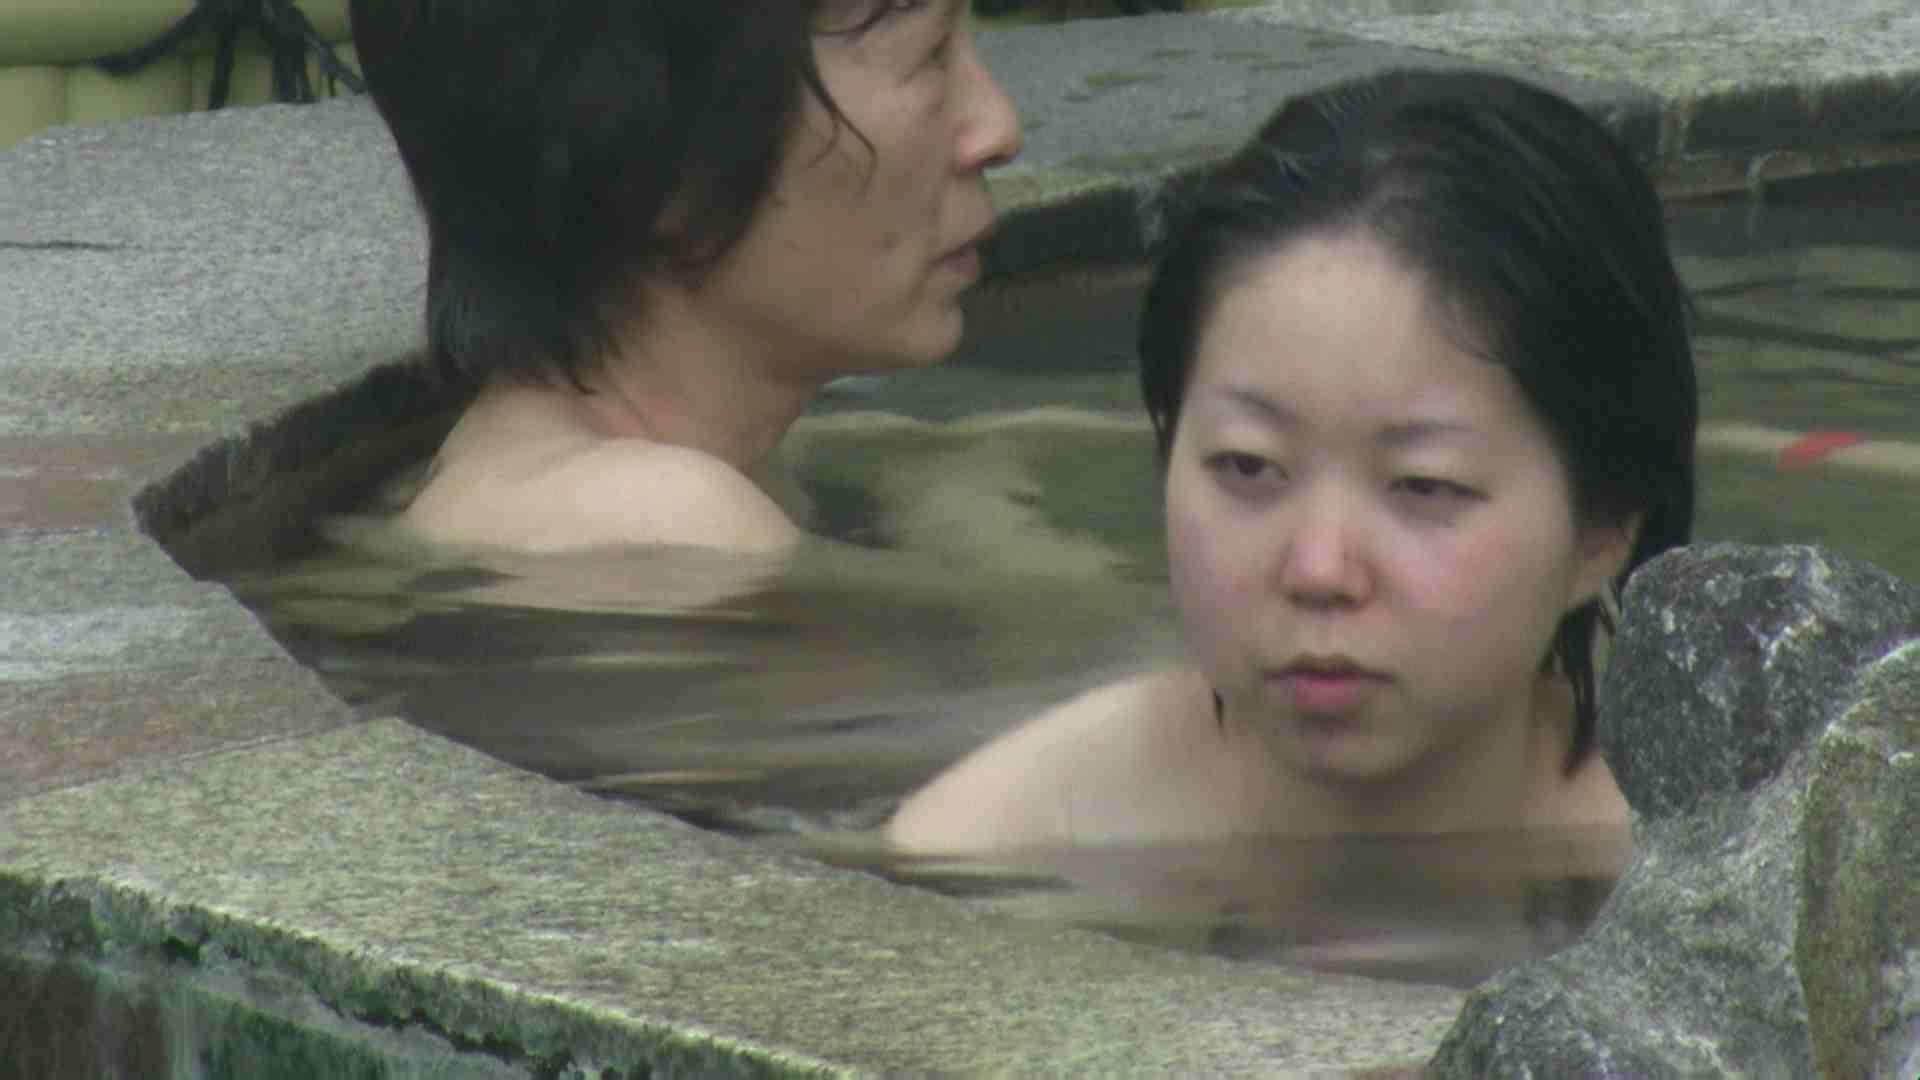 Aquaな露天風呂Vol.06【VIP】 露天 | OLのプライベート  11pic 7